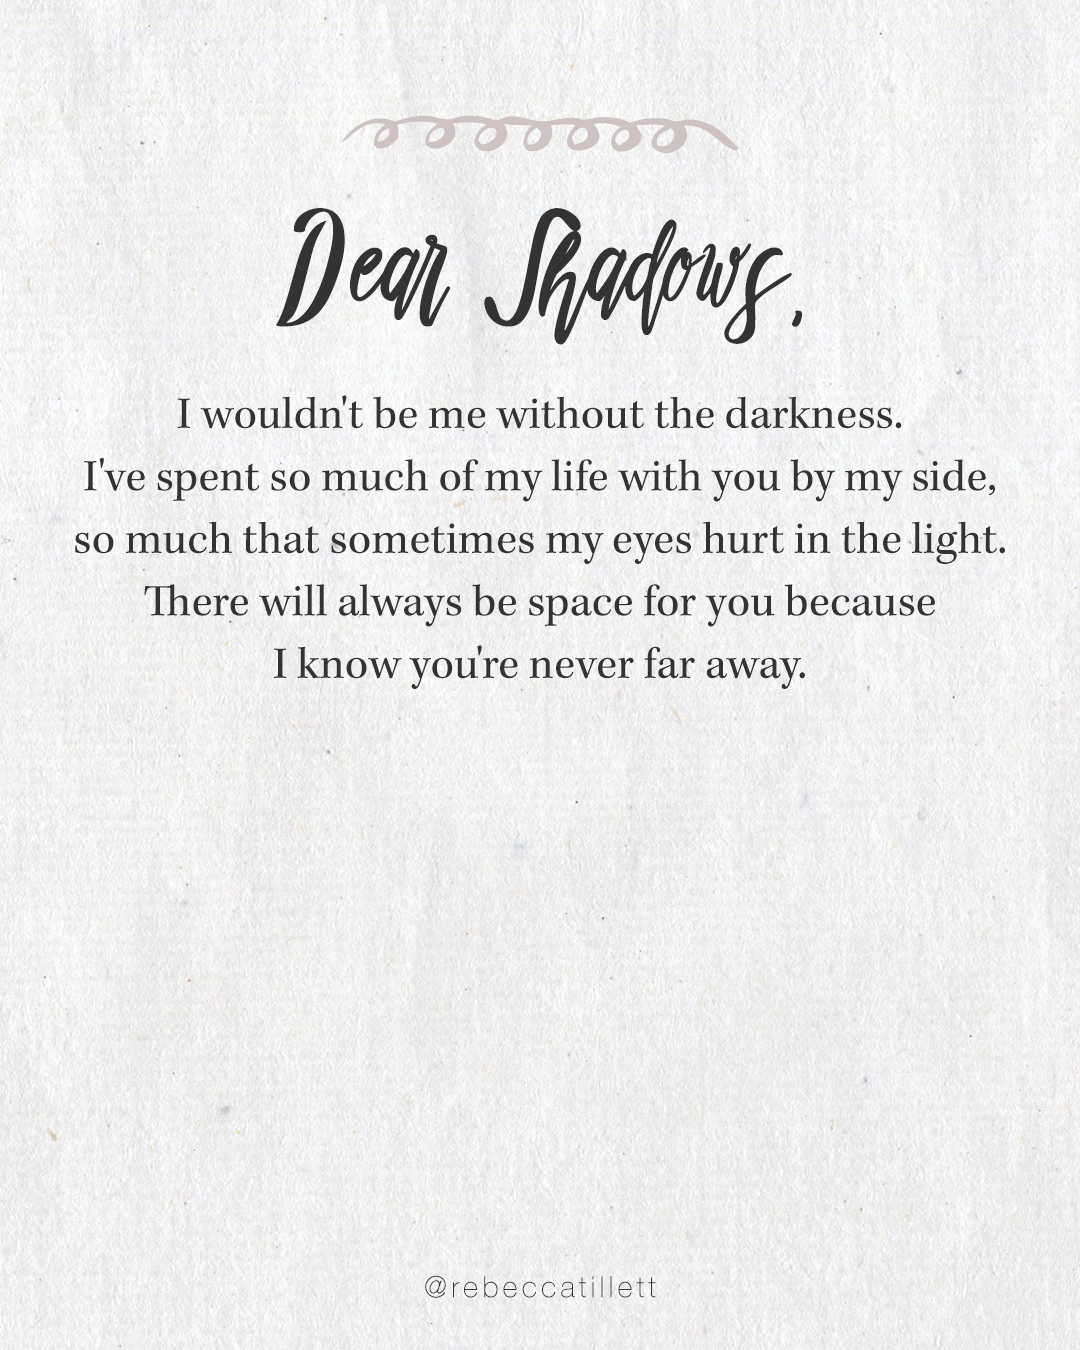 Dear Shadows